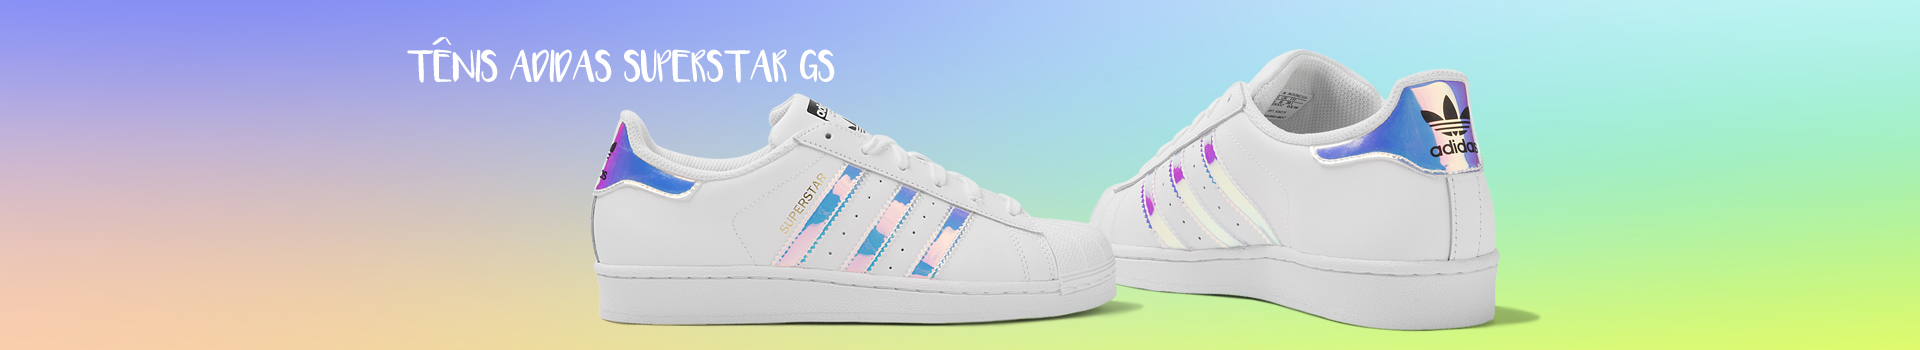 tvdesk_p5-14_09_18-adidas_Superstar